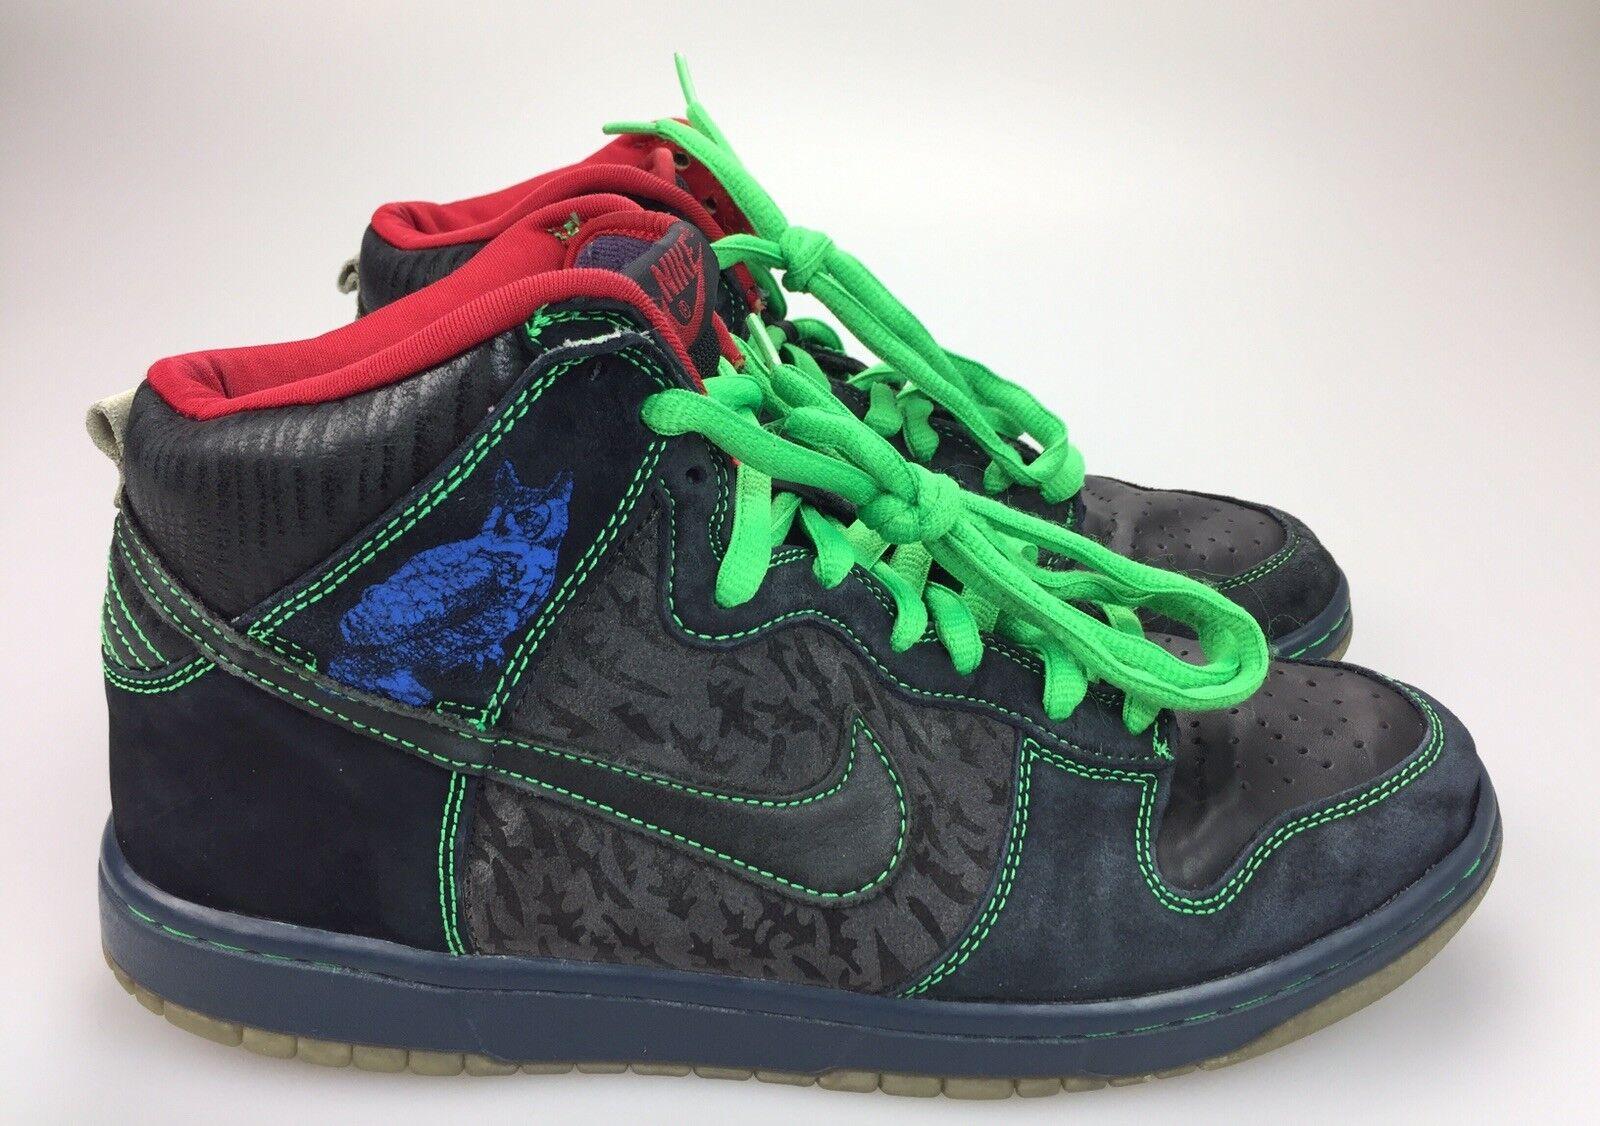 2008 Nike Dunk High Premium SB Twin Peaks Night Owl Black bluee 313171-006 Men 10